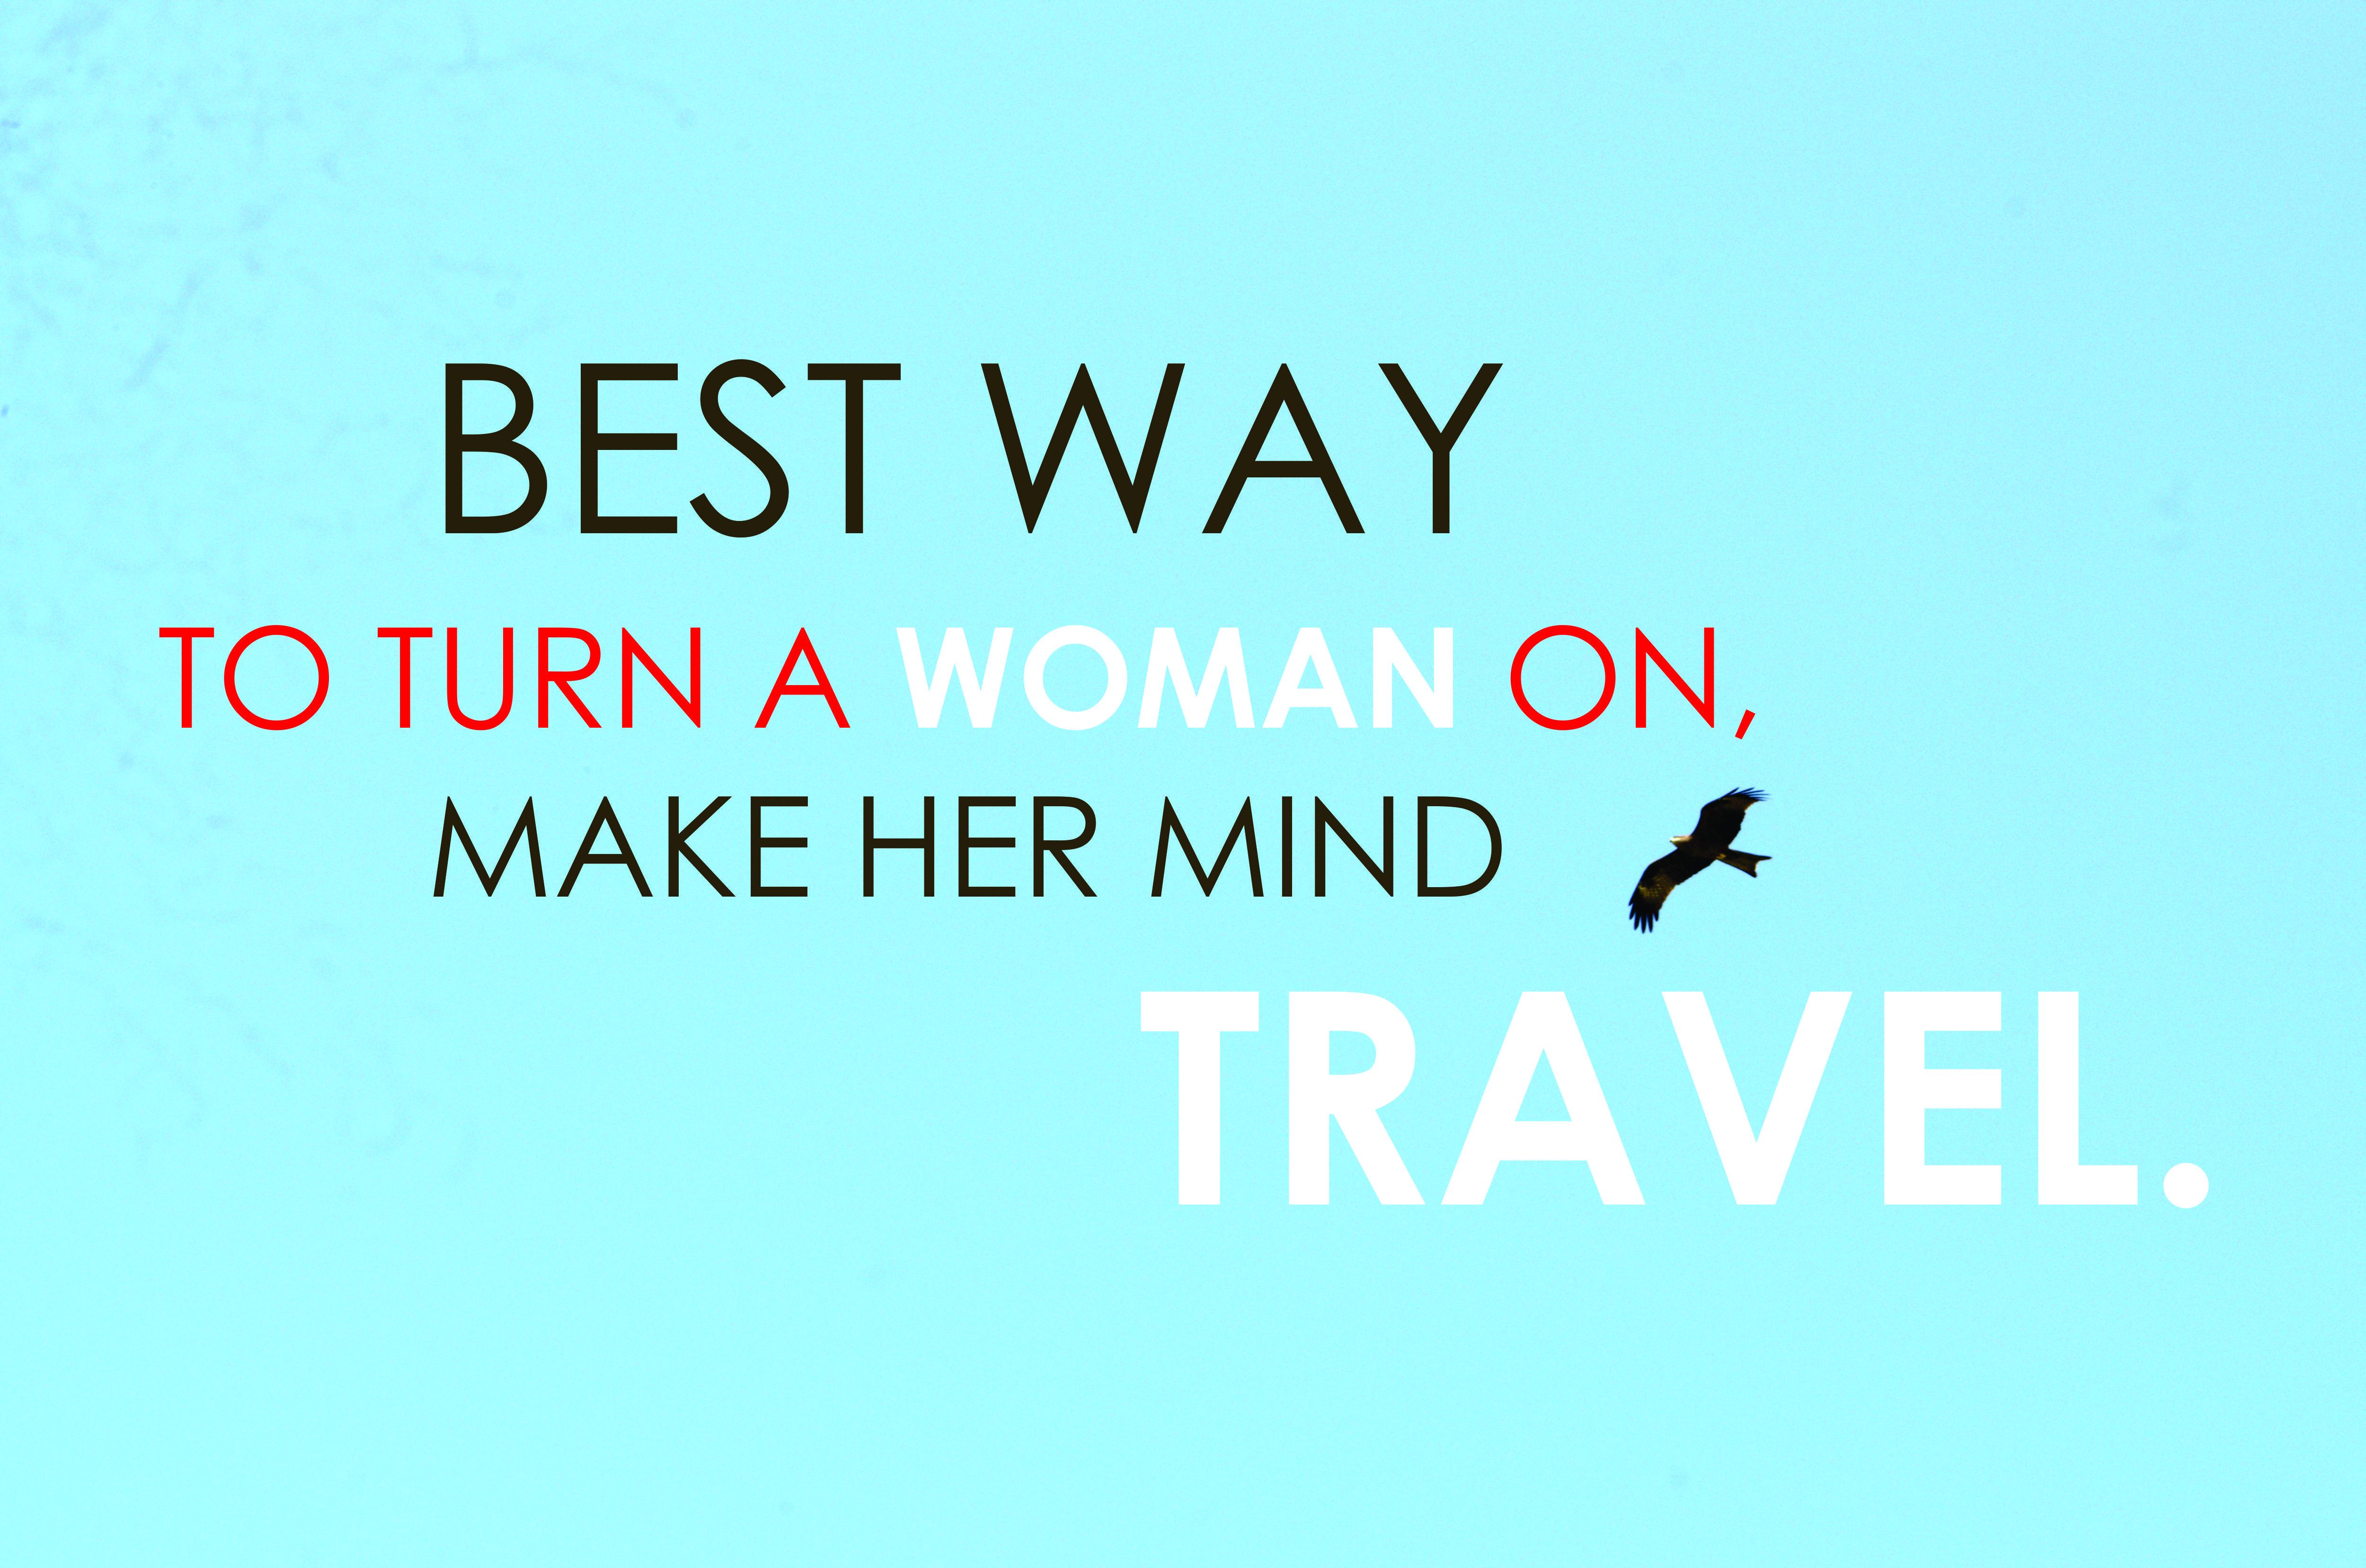 Make her mind travel :-D | Travel quotes, Unique ...